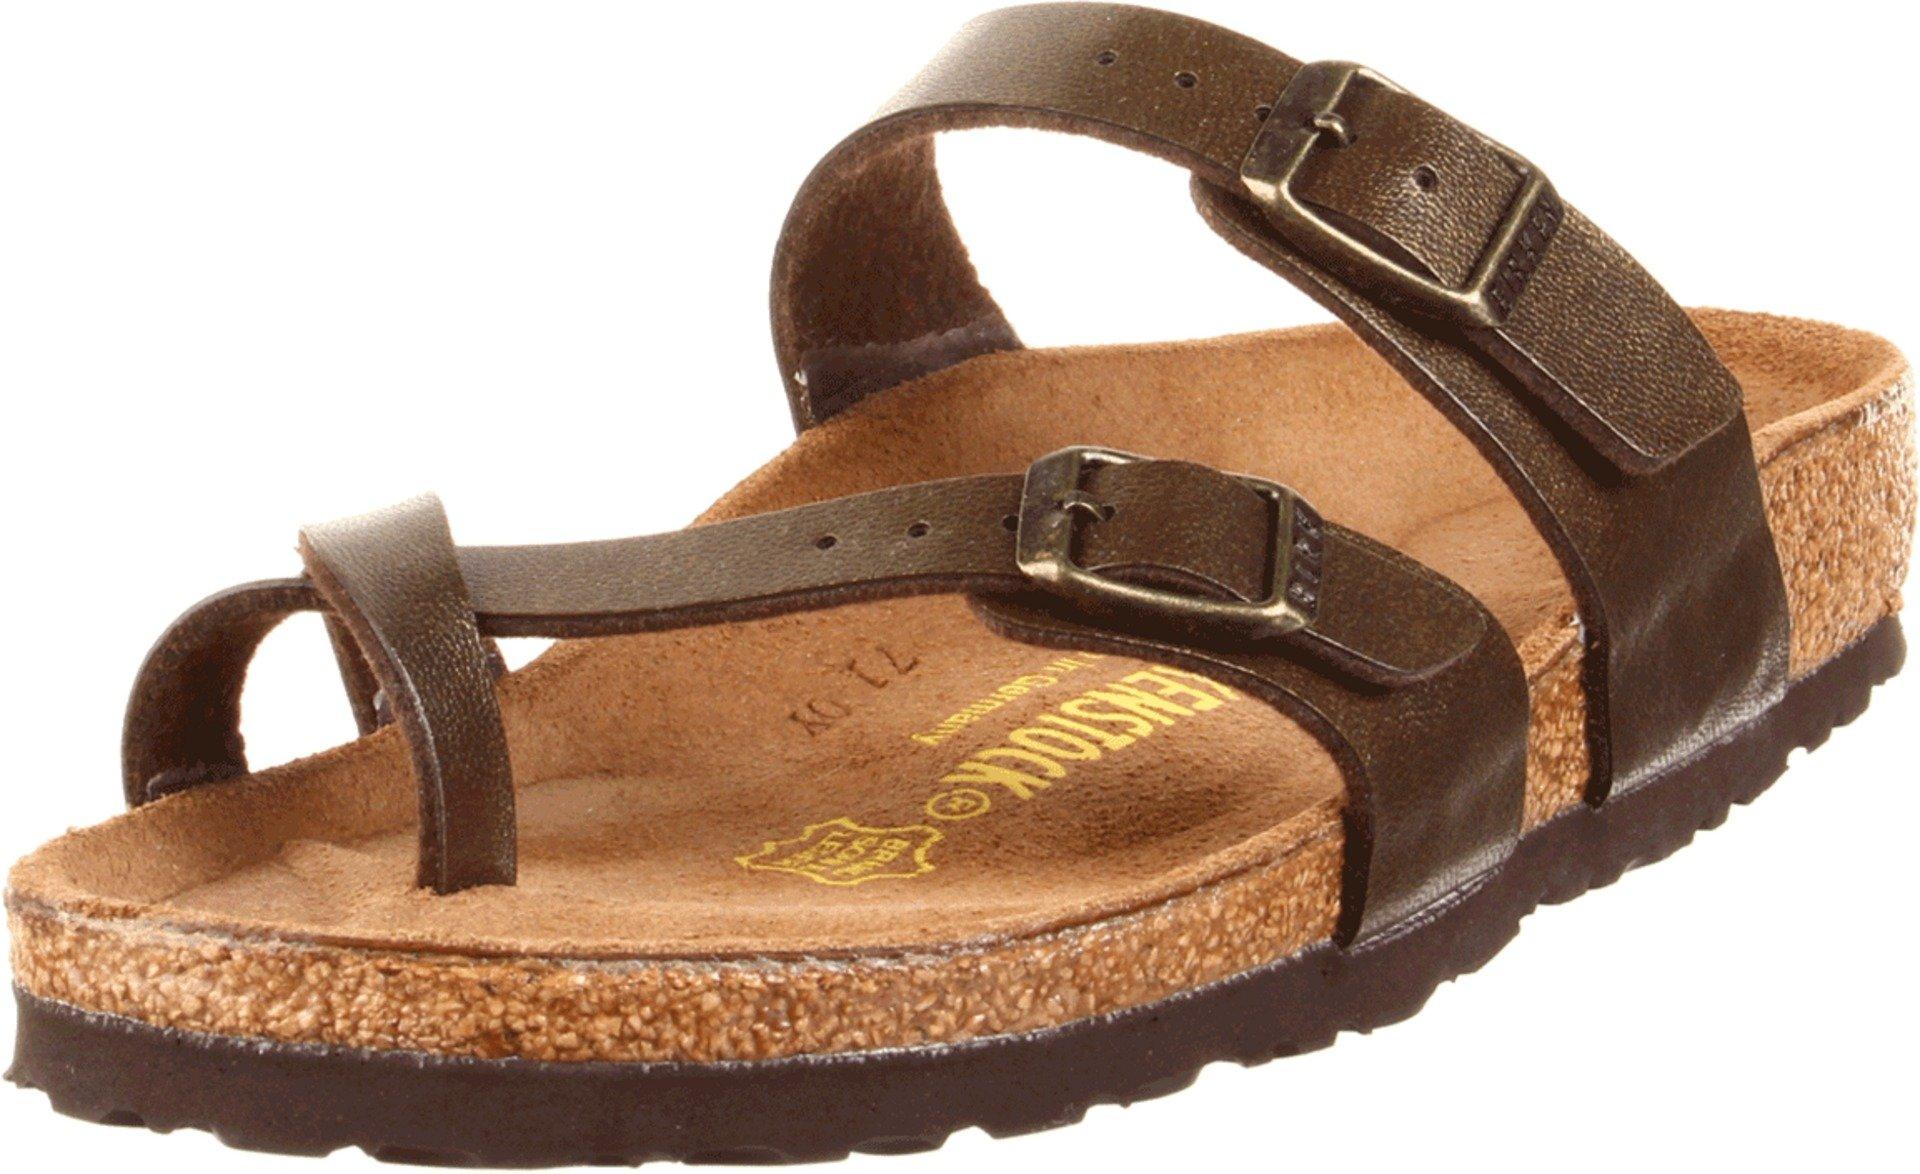 Birkenstock Women's Mayari Sandal,Golden Brown,40 EU/9-9.5 N US by Birkenstock